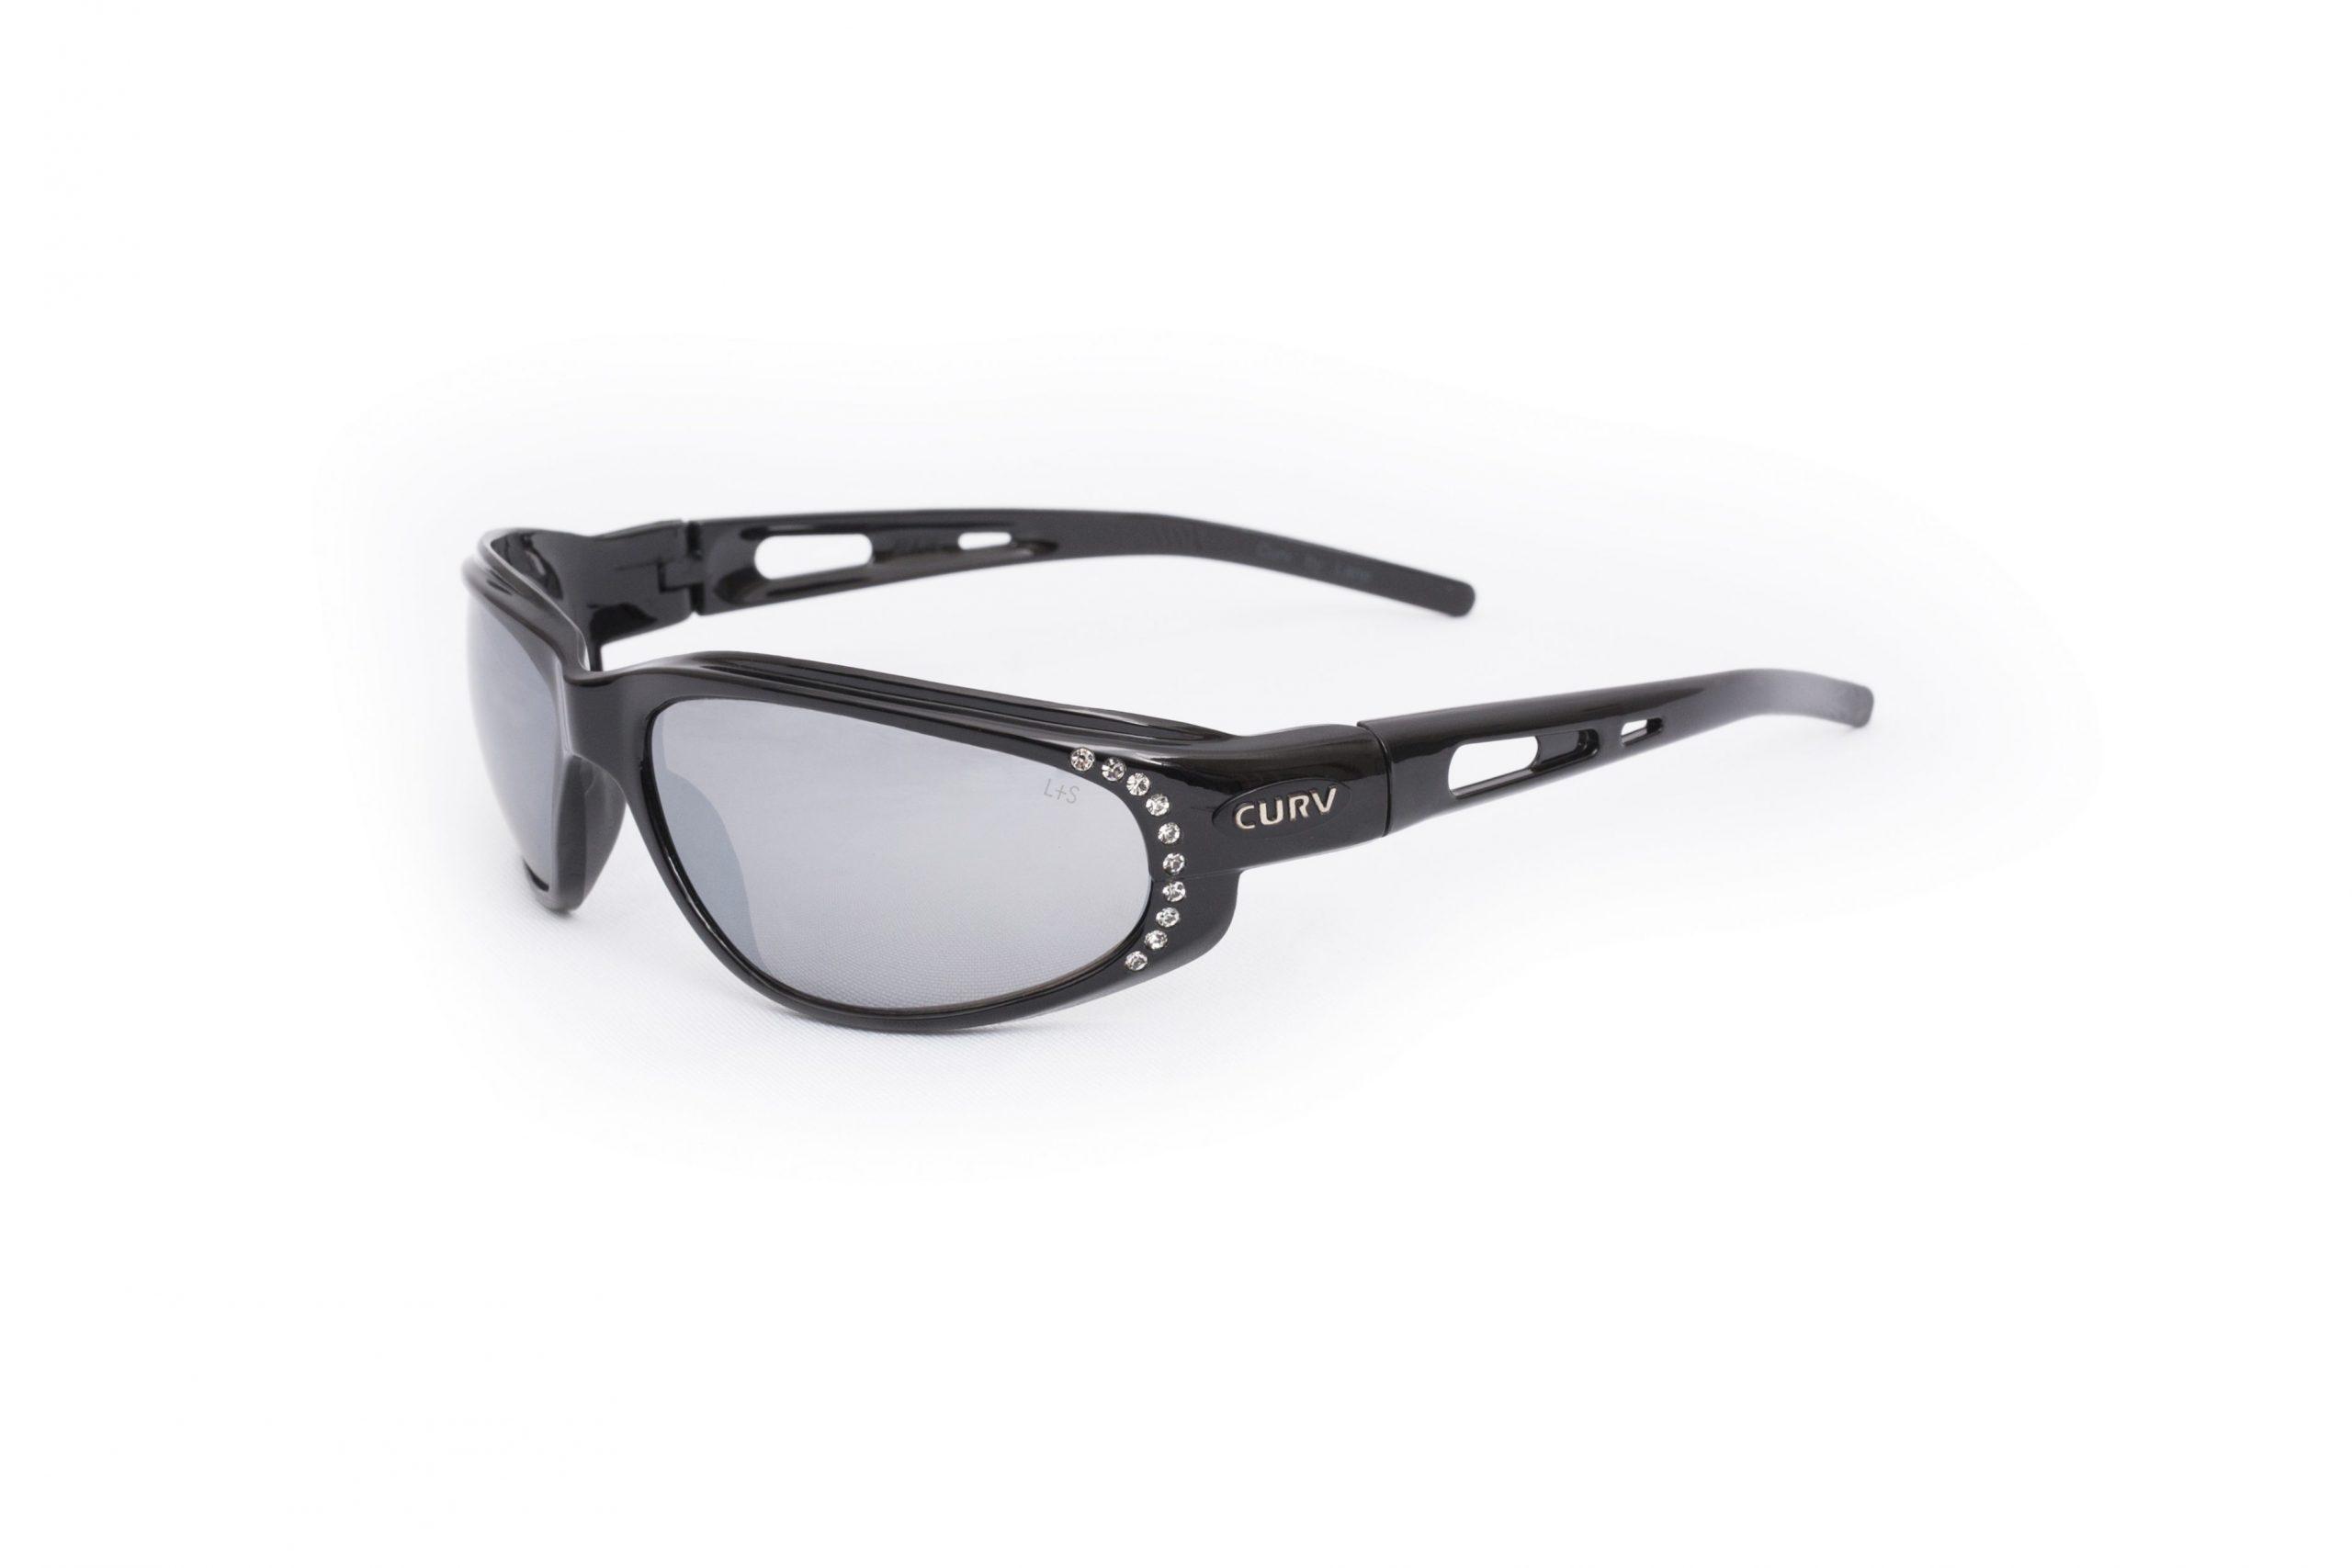 01-33 - Curv Black Rhinestone Sunglasses with Flash Mirror Lenses and Glossy Black Frames